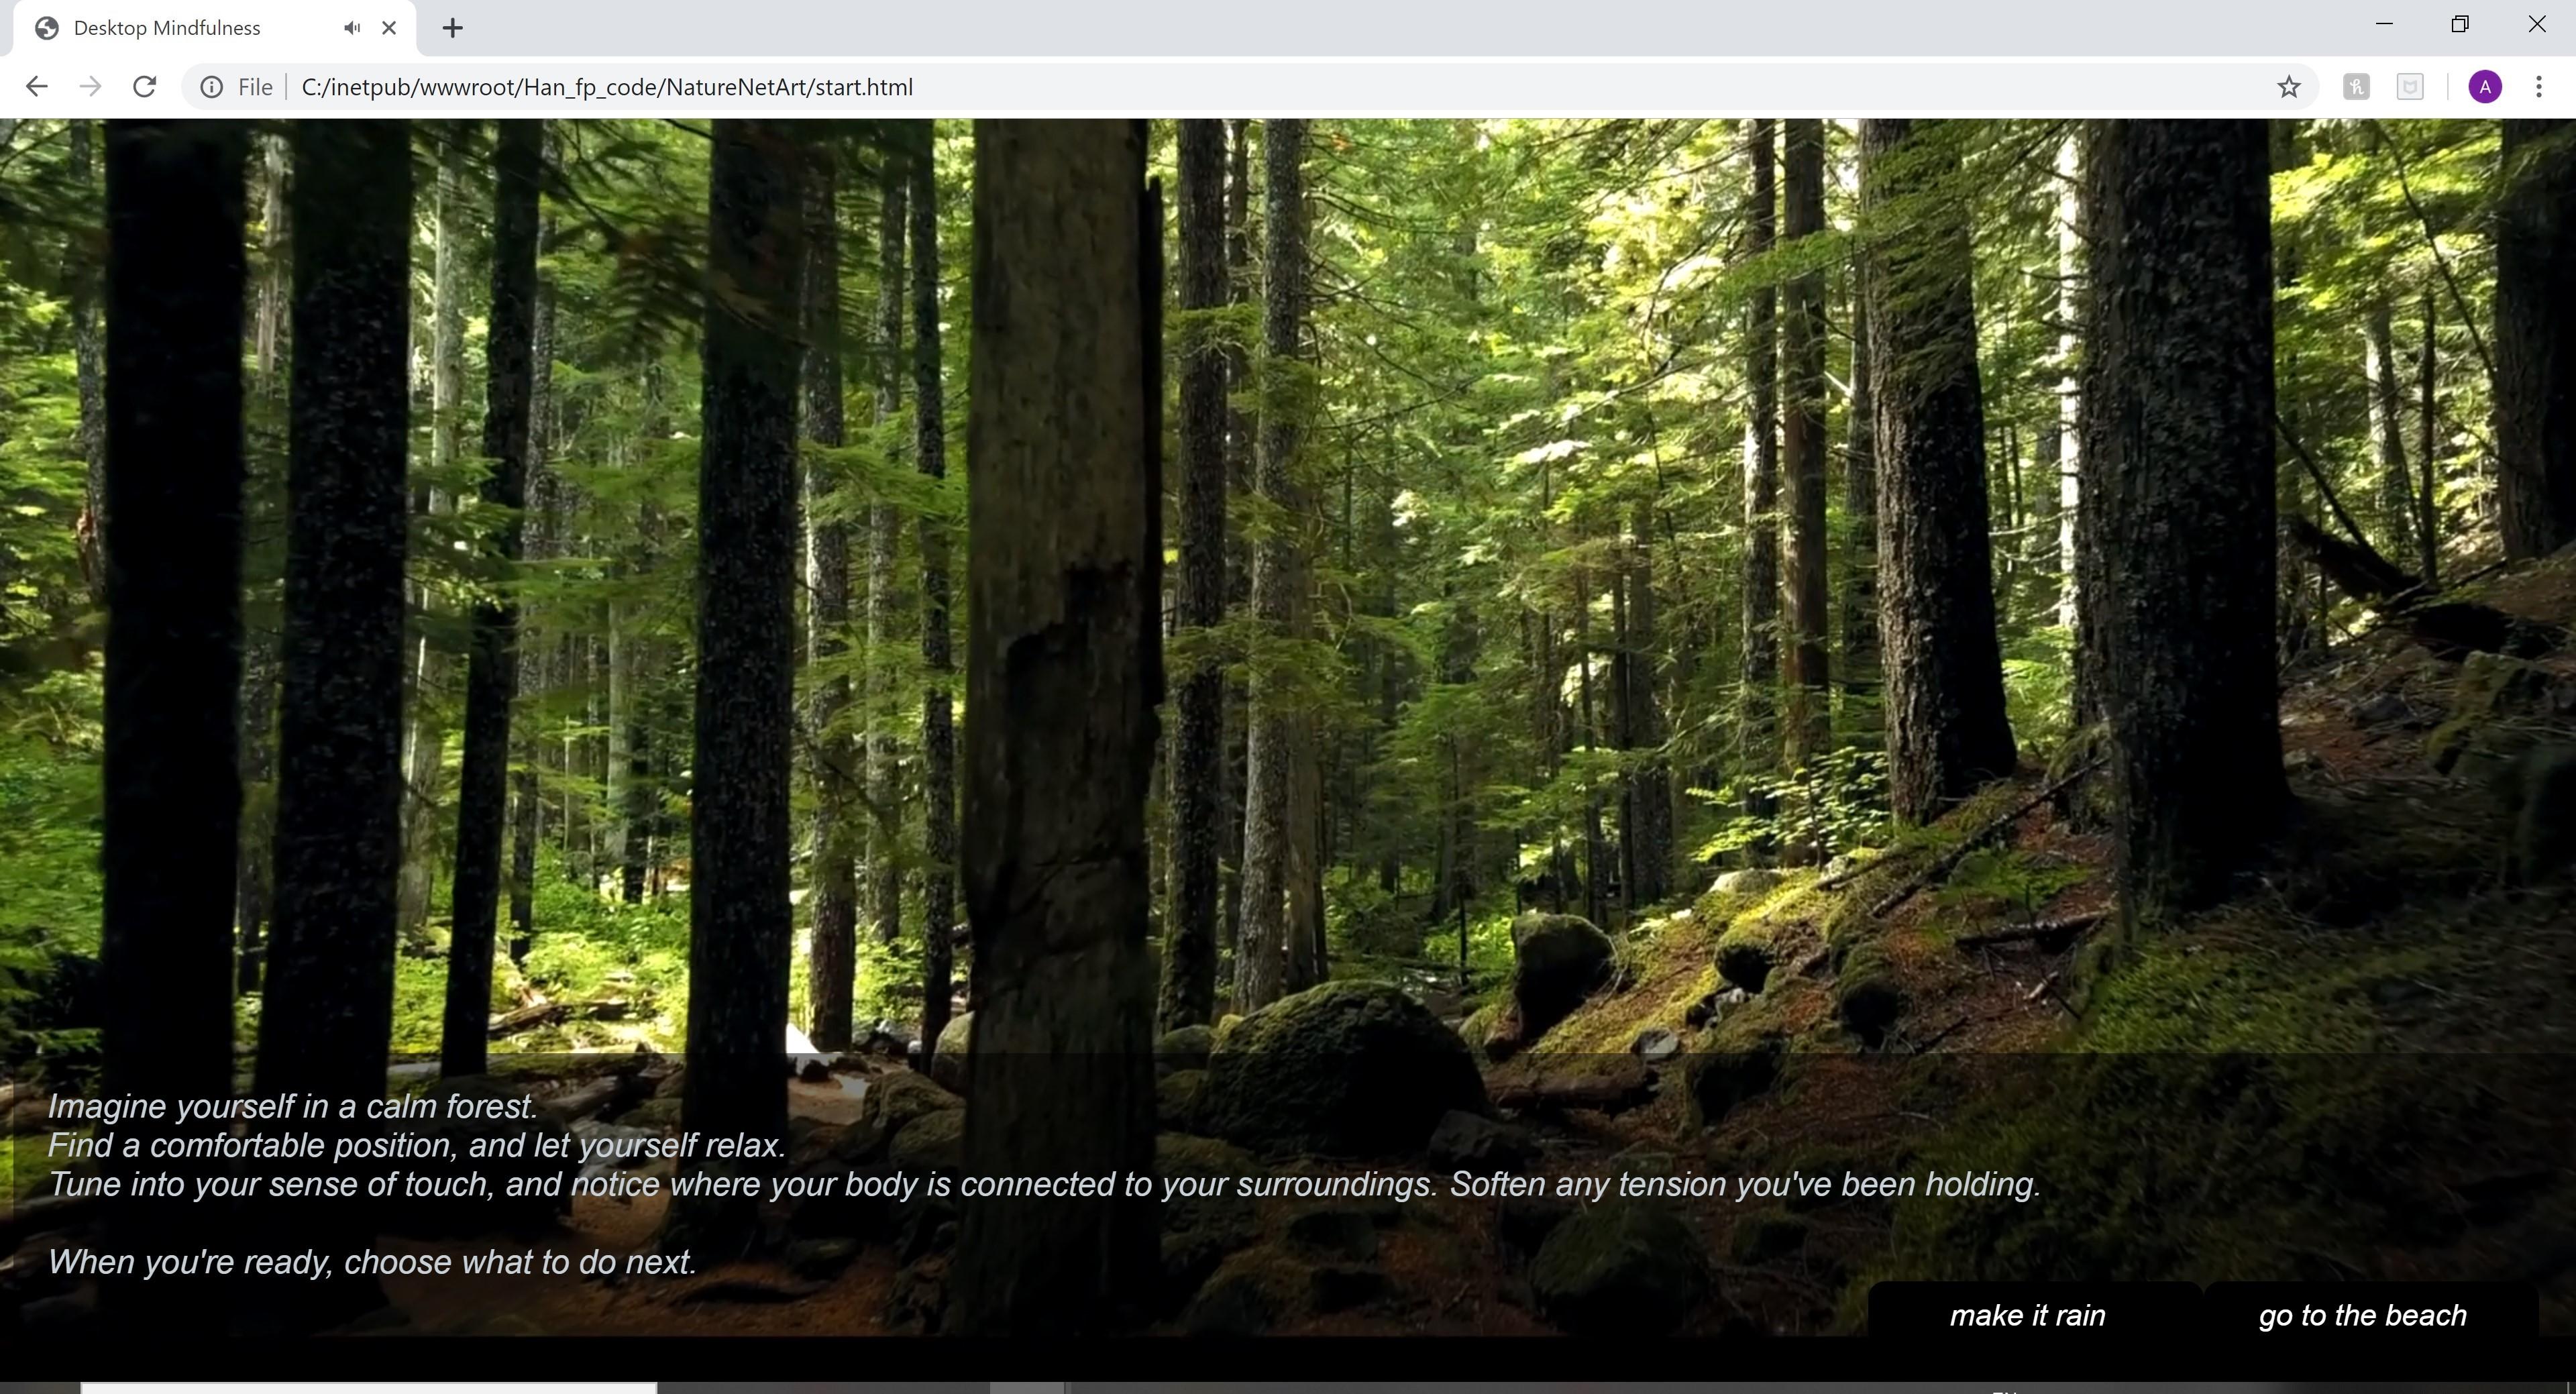 a screenshot of the Desktop Mindfulness website,                              showing meditation instructions over a background of trees